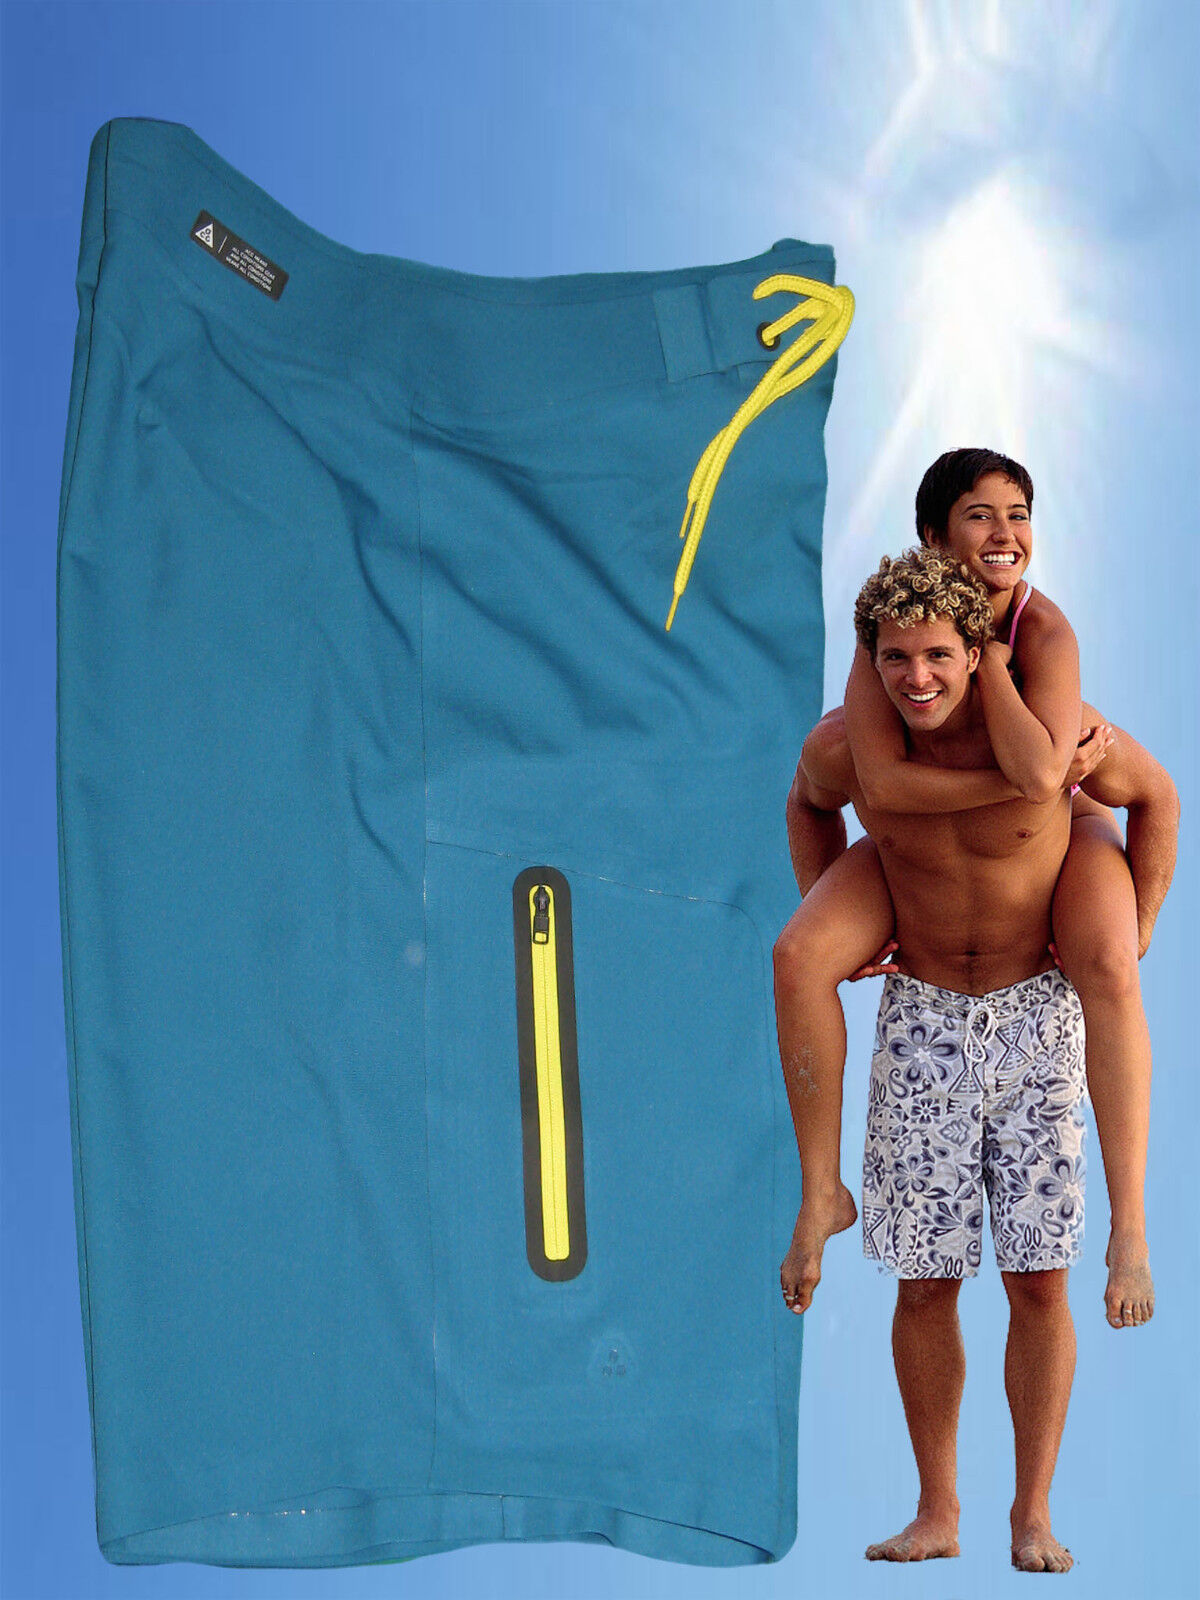 NEW NIKE ACG Laser Cut Heat Sealed Active Beach Water Sports Board Shorts M